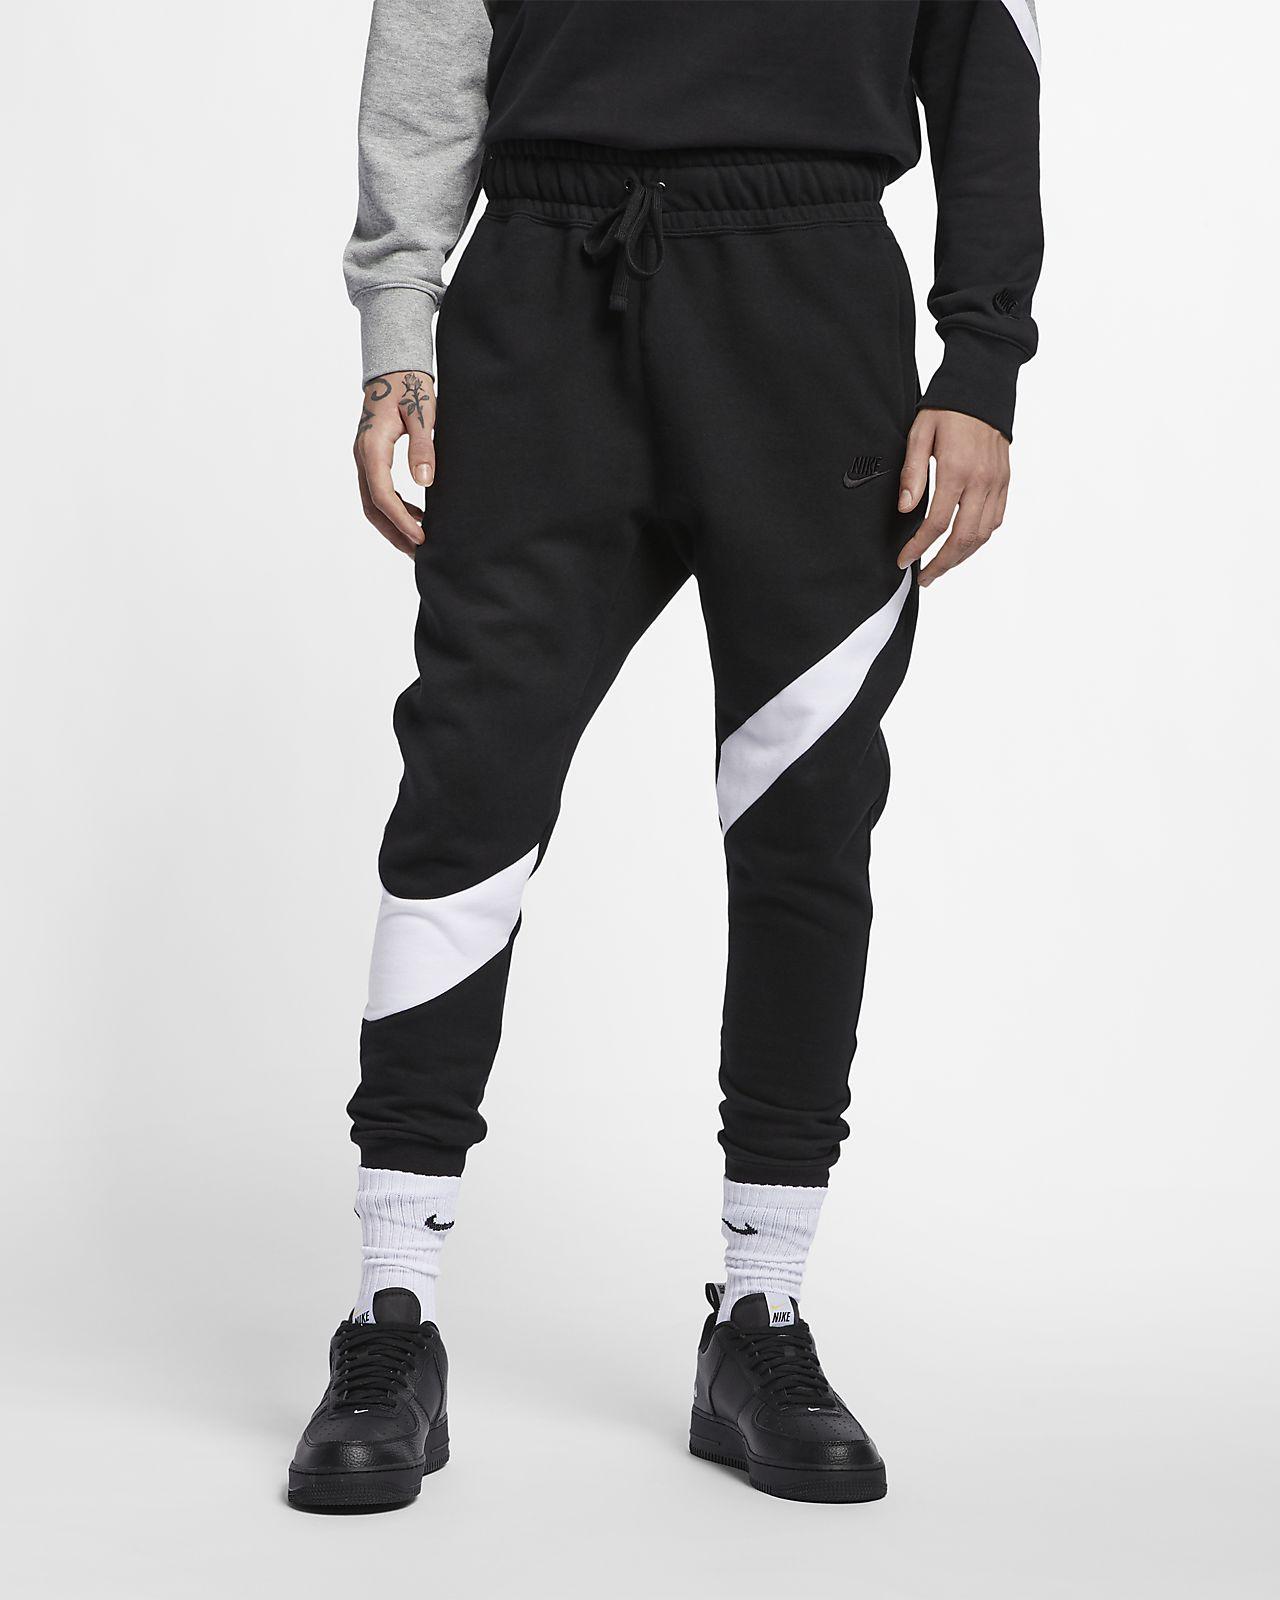 ec3b30b1ee Nike Sportswear Men s Trousers. Nike.com HU